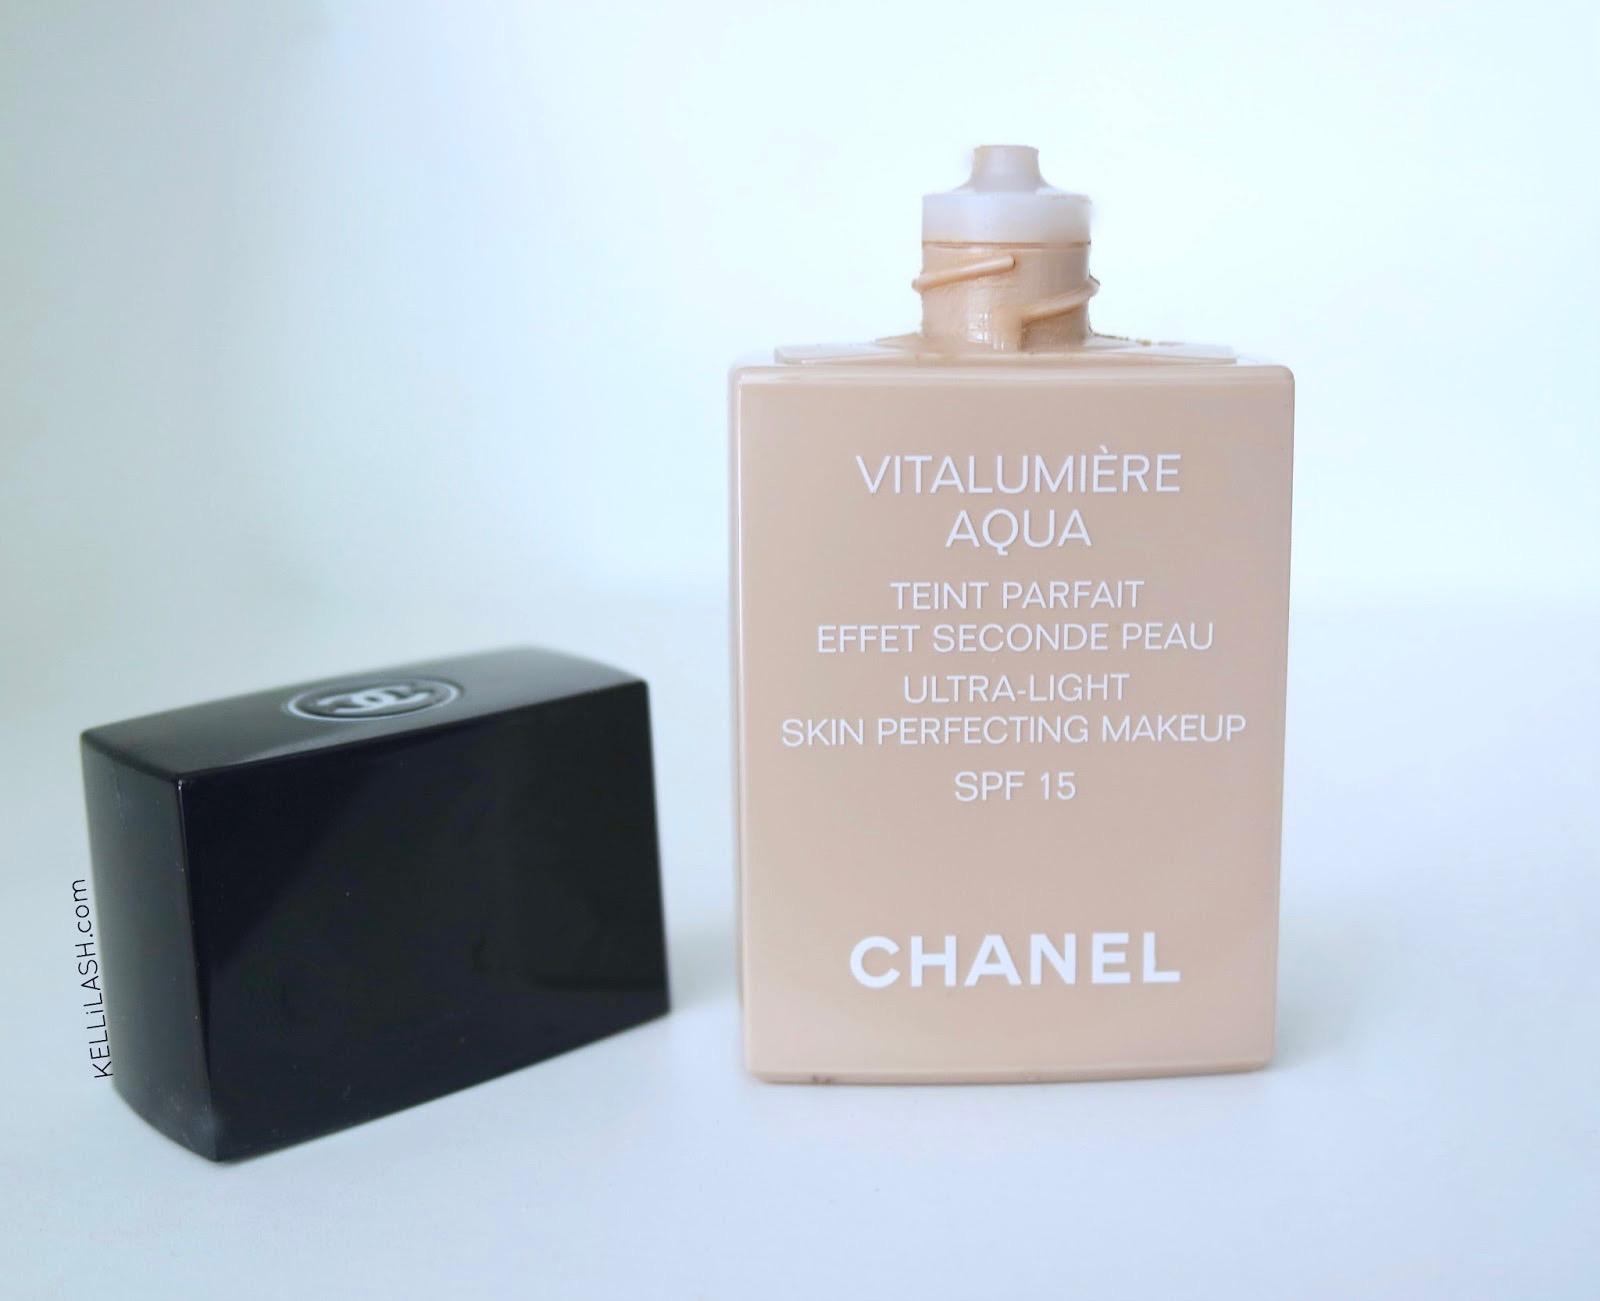 Foundation My Top 5 Favourites Kellilash Chanel Vitalumire Aqua Ultra Light Skin Perfecting Makeup Spf 15 Vitalumiere B20 Beige